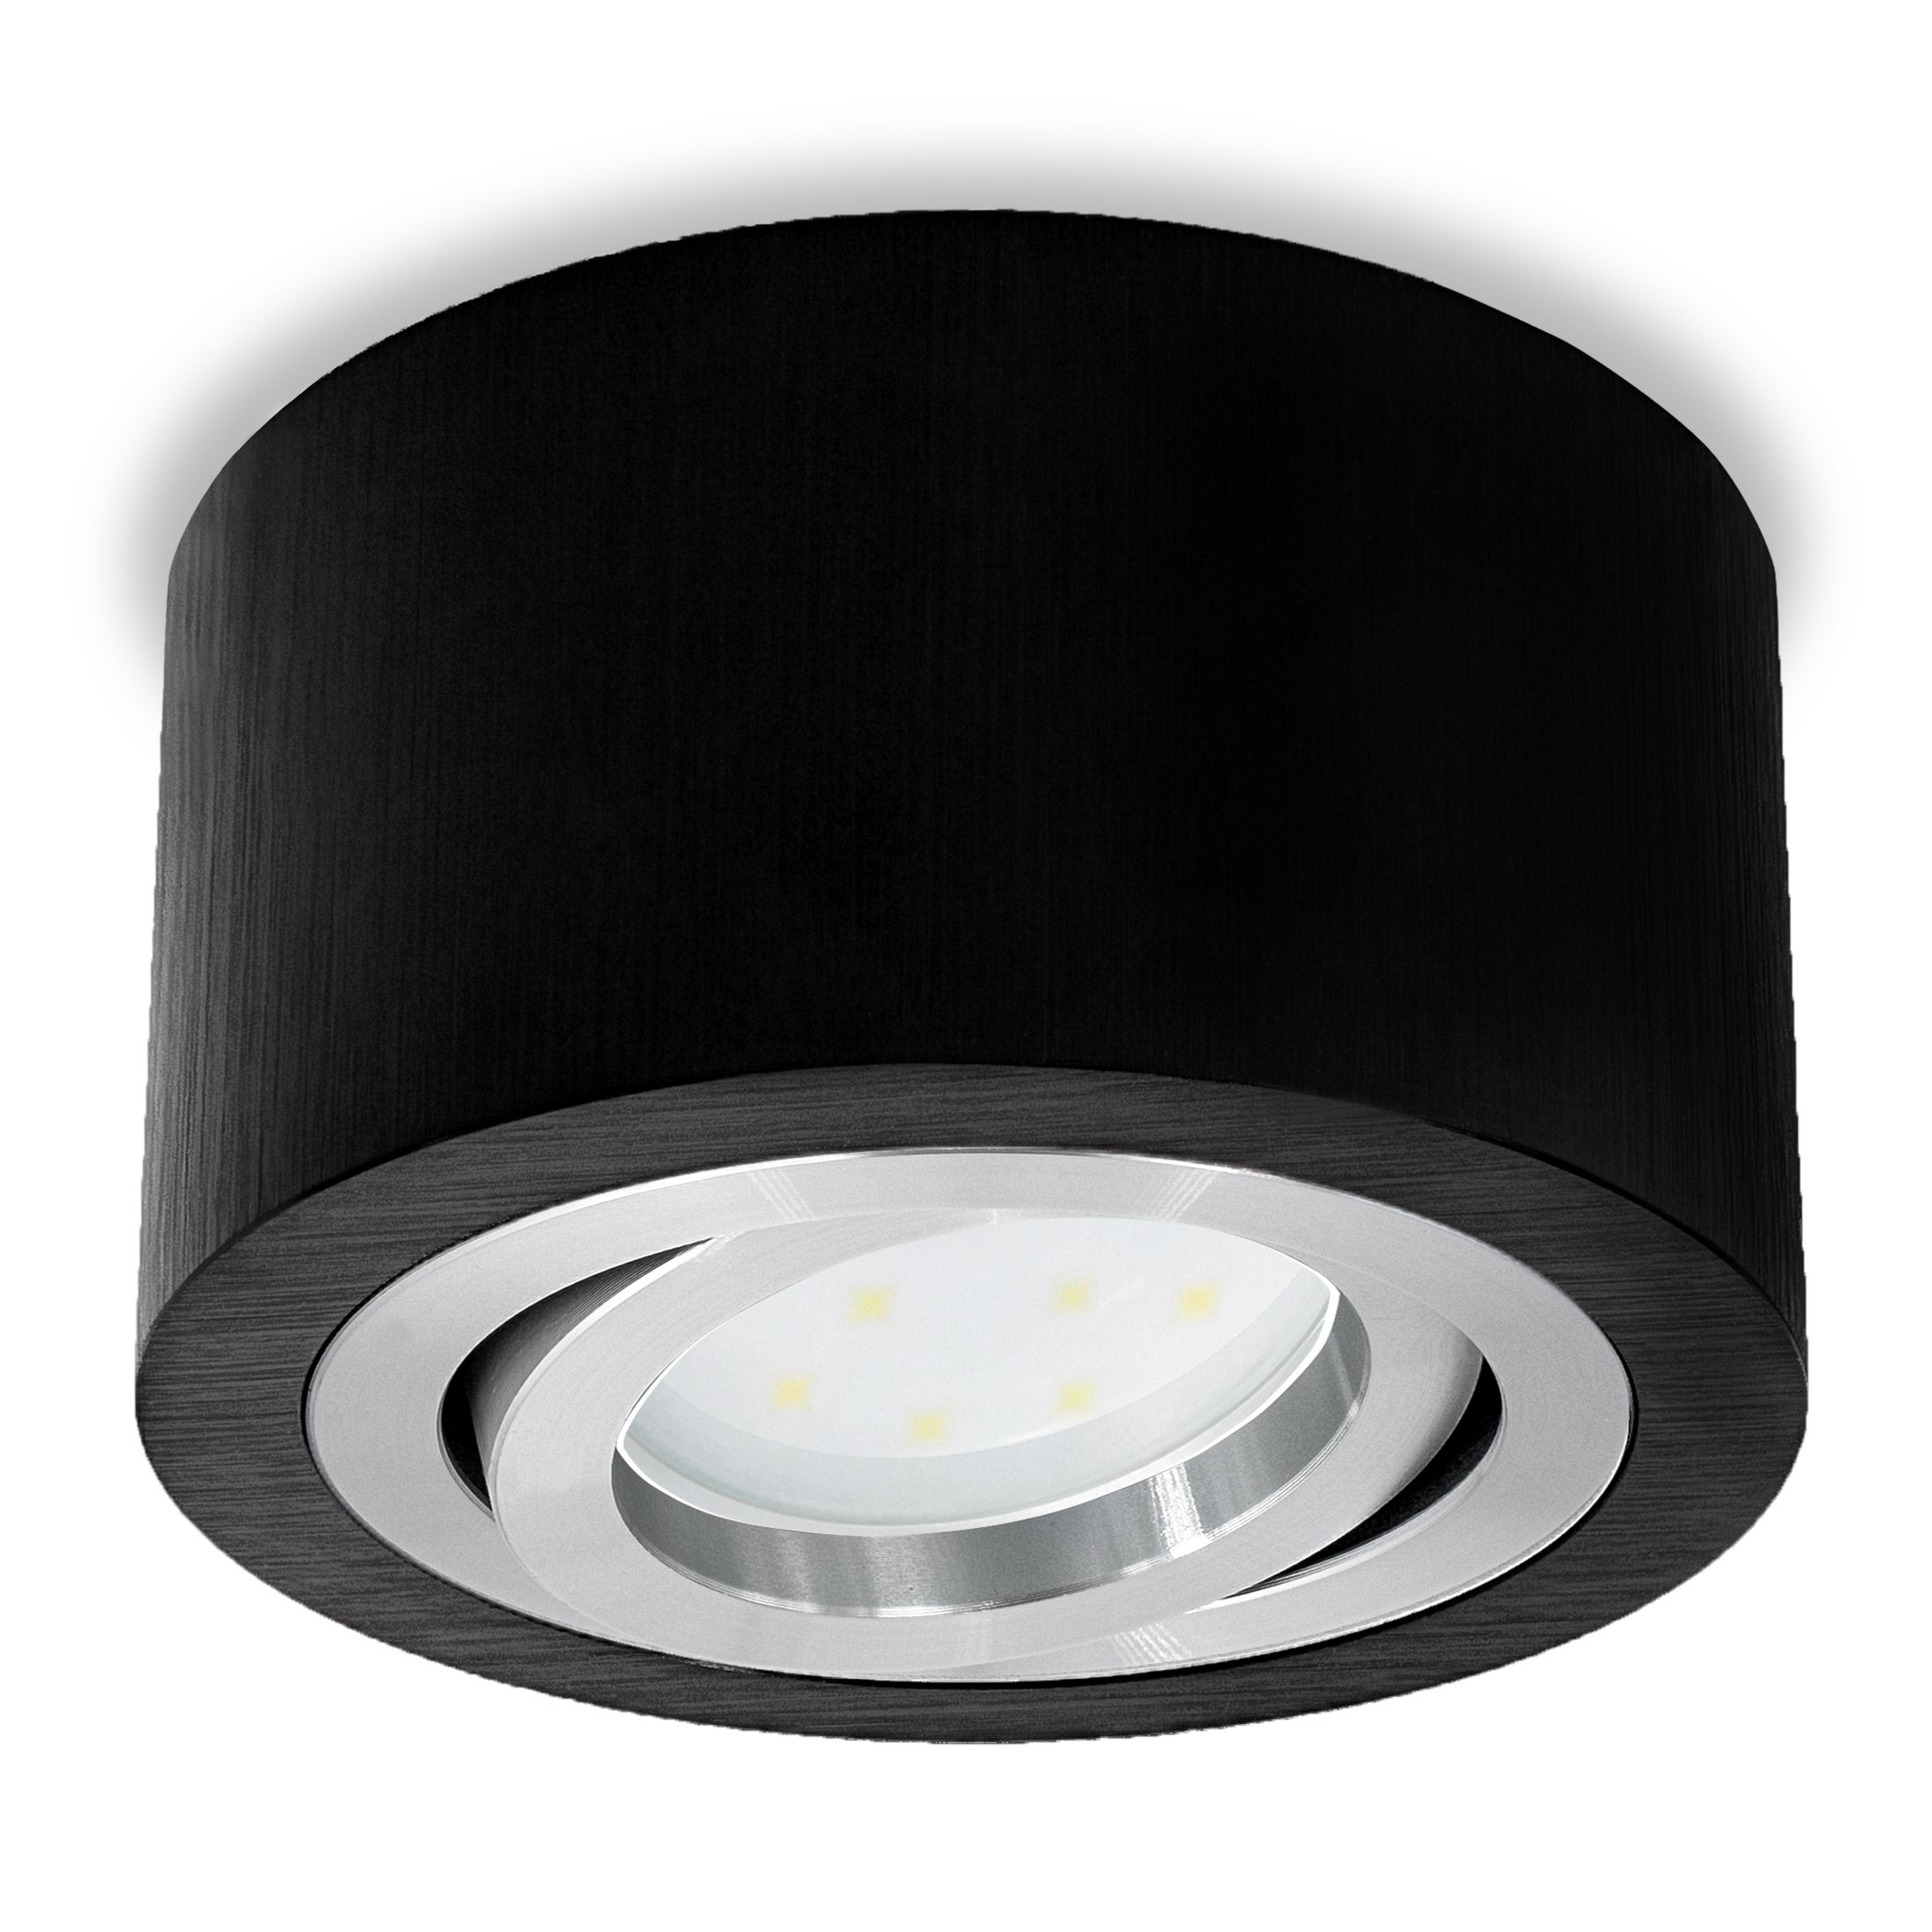 Flacher Decken Aufbau Spot Alu Schwarz Schwenkbar Inkl Led Modul 5w Warm Weiss 230v In 2020 Led Lighting Interior